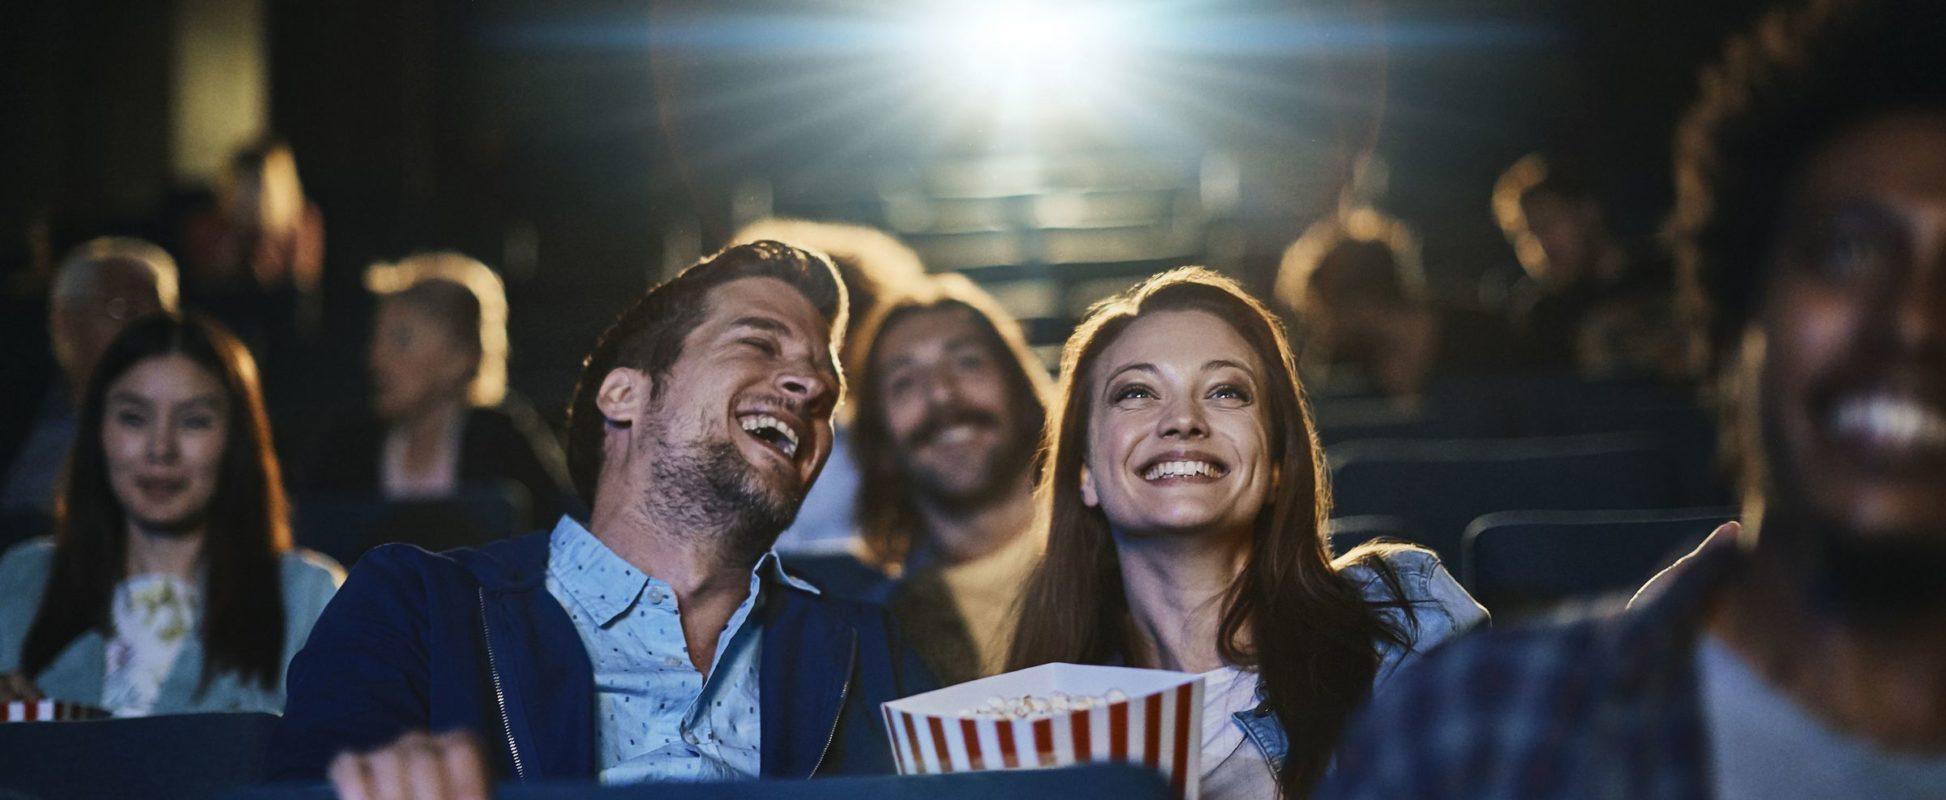 Movie Club London